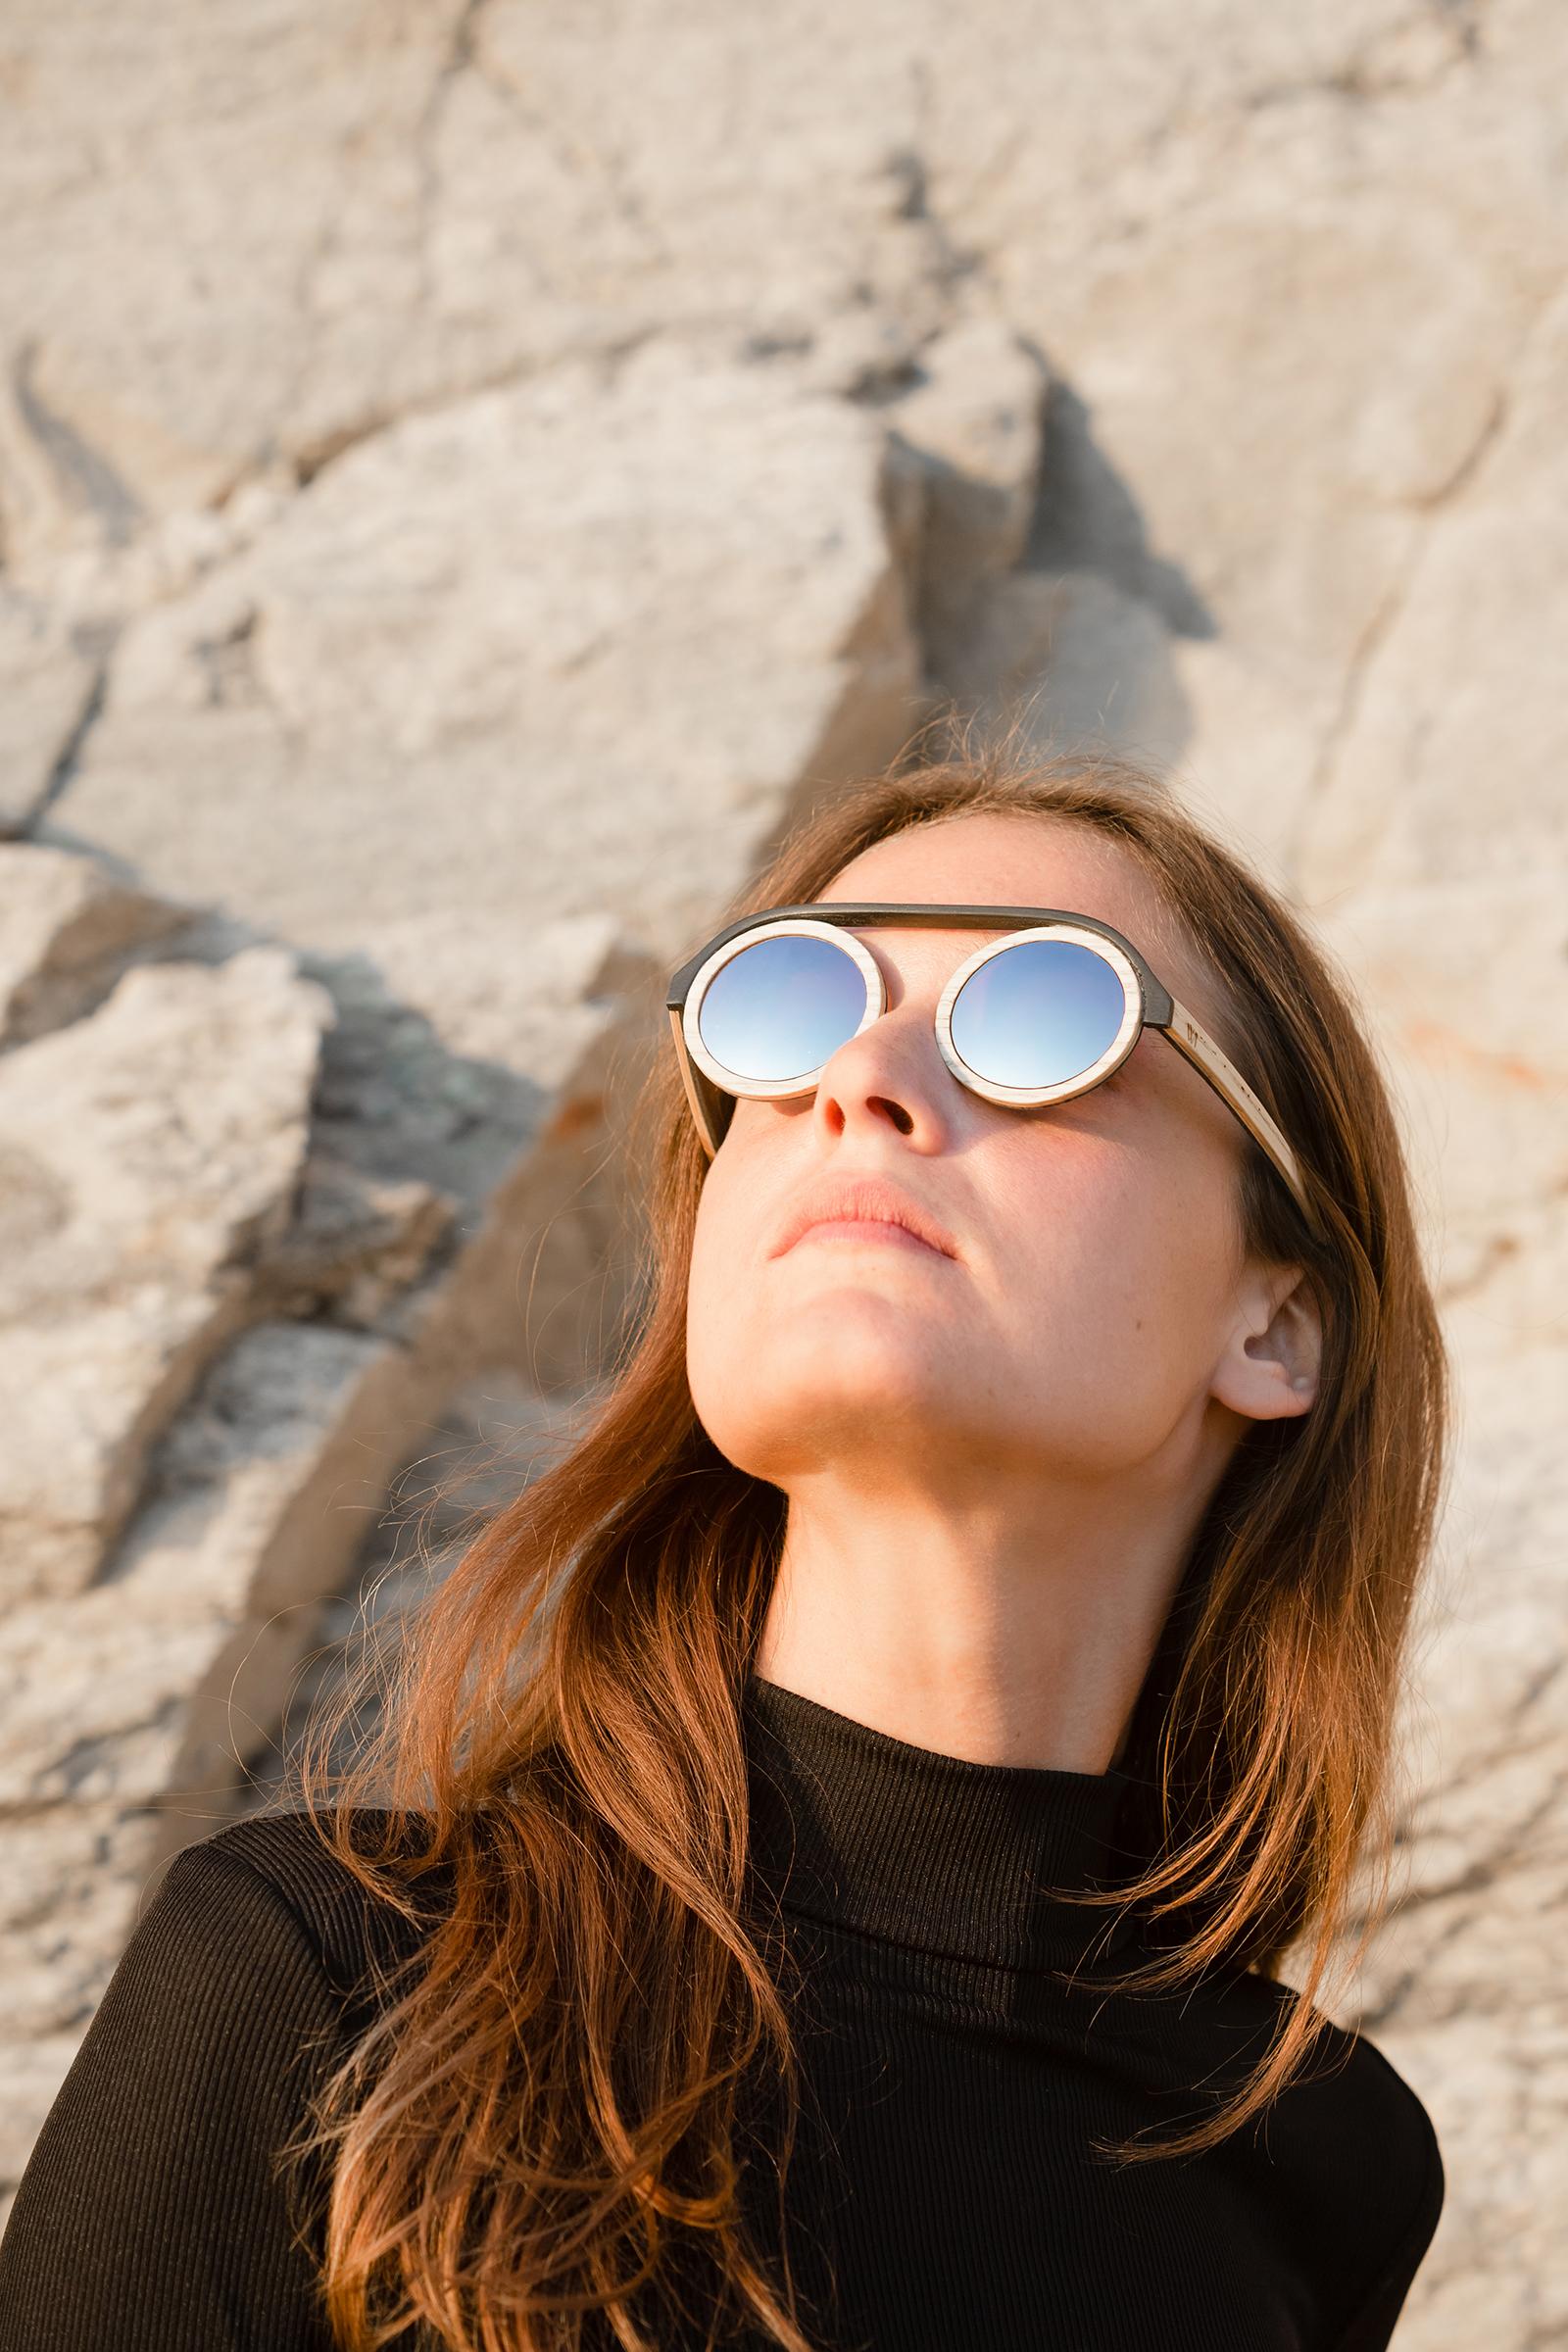 samuellstudio_samuell_©samuel lehuédé_quiberon_cotesauvage_sunglasses_peaks_studiojoranbriand_photography_A00A9117